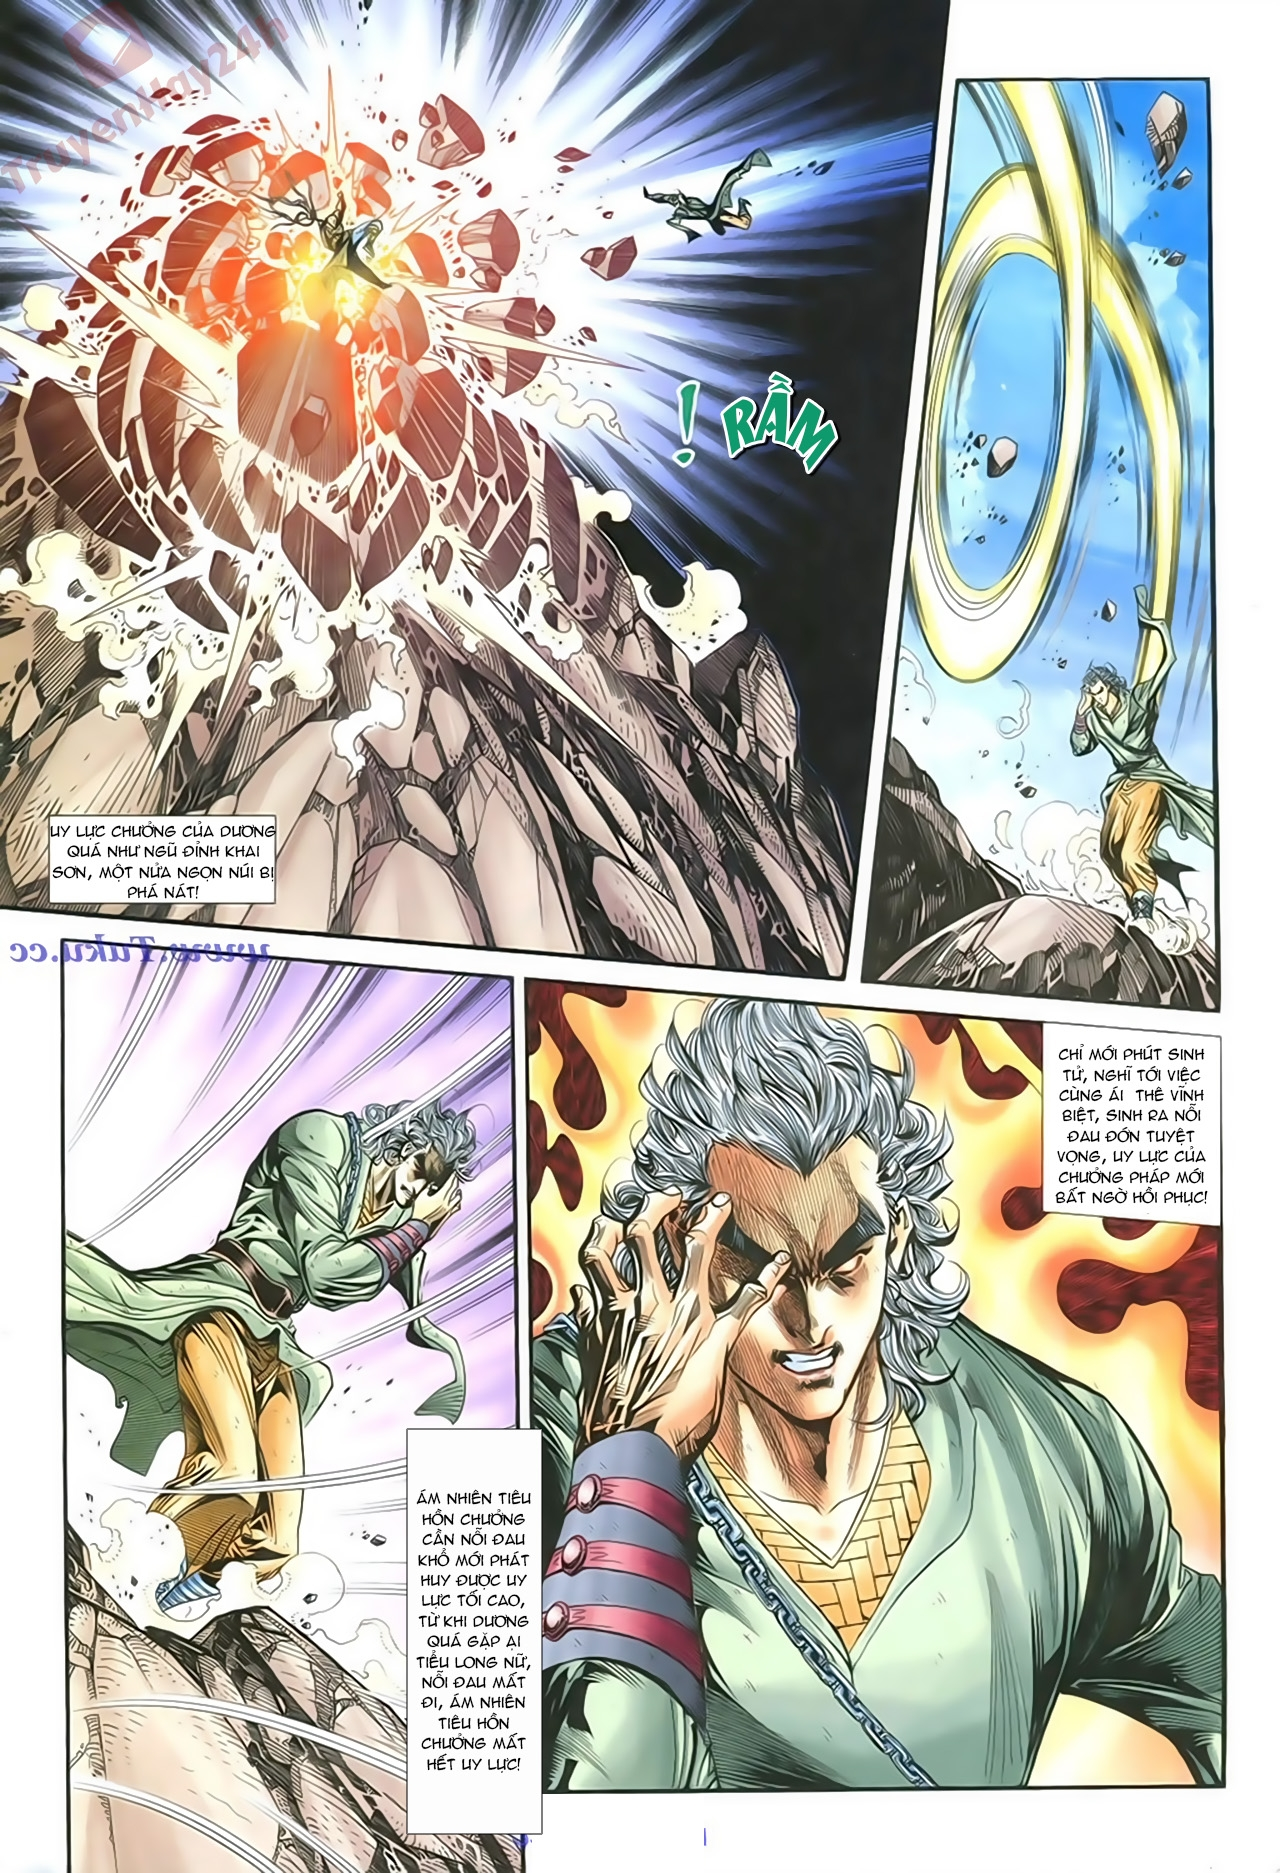 Thần Điêu Hiệp Lữ chap 86 – End Trang 15 - Mangak.info